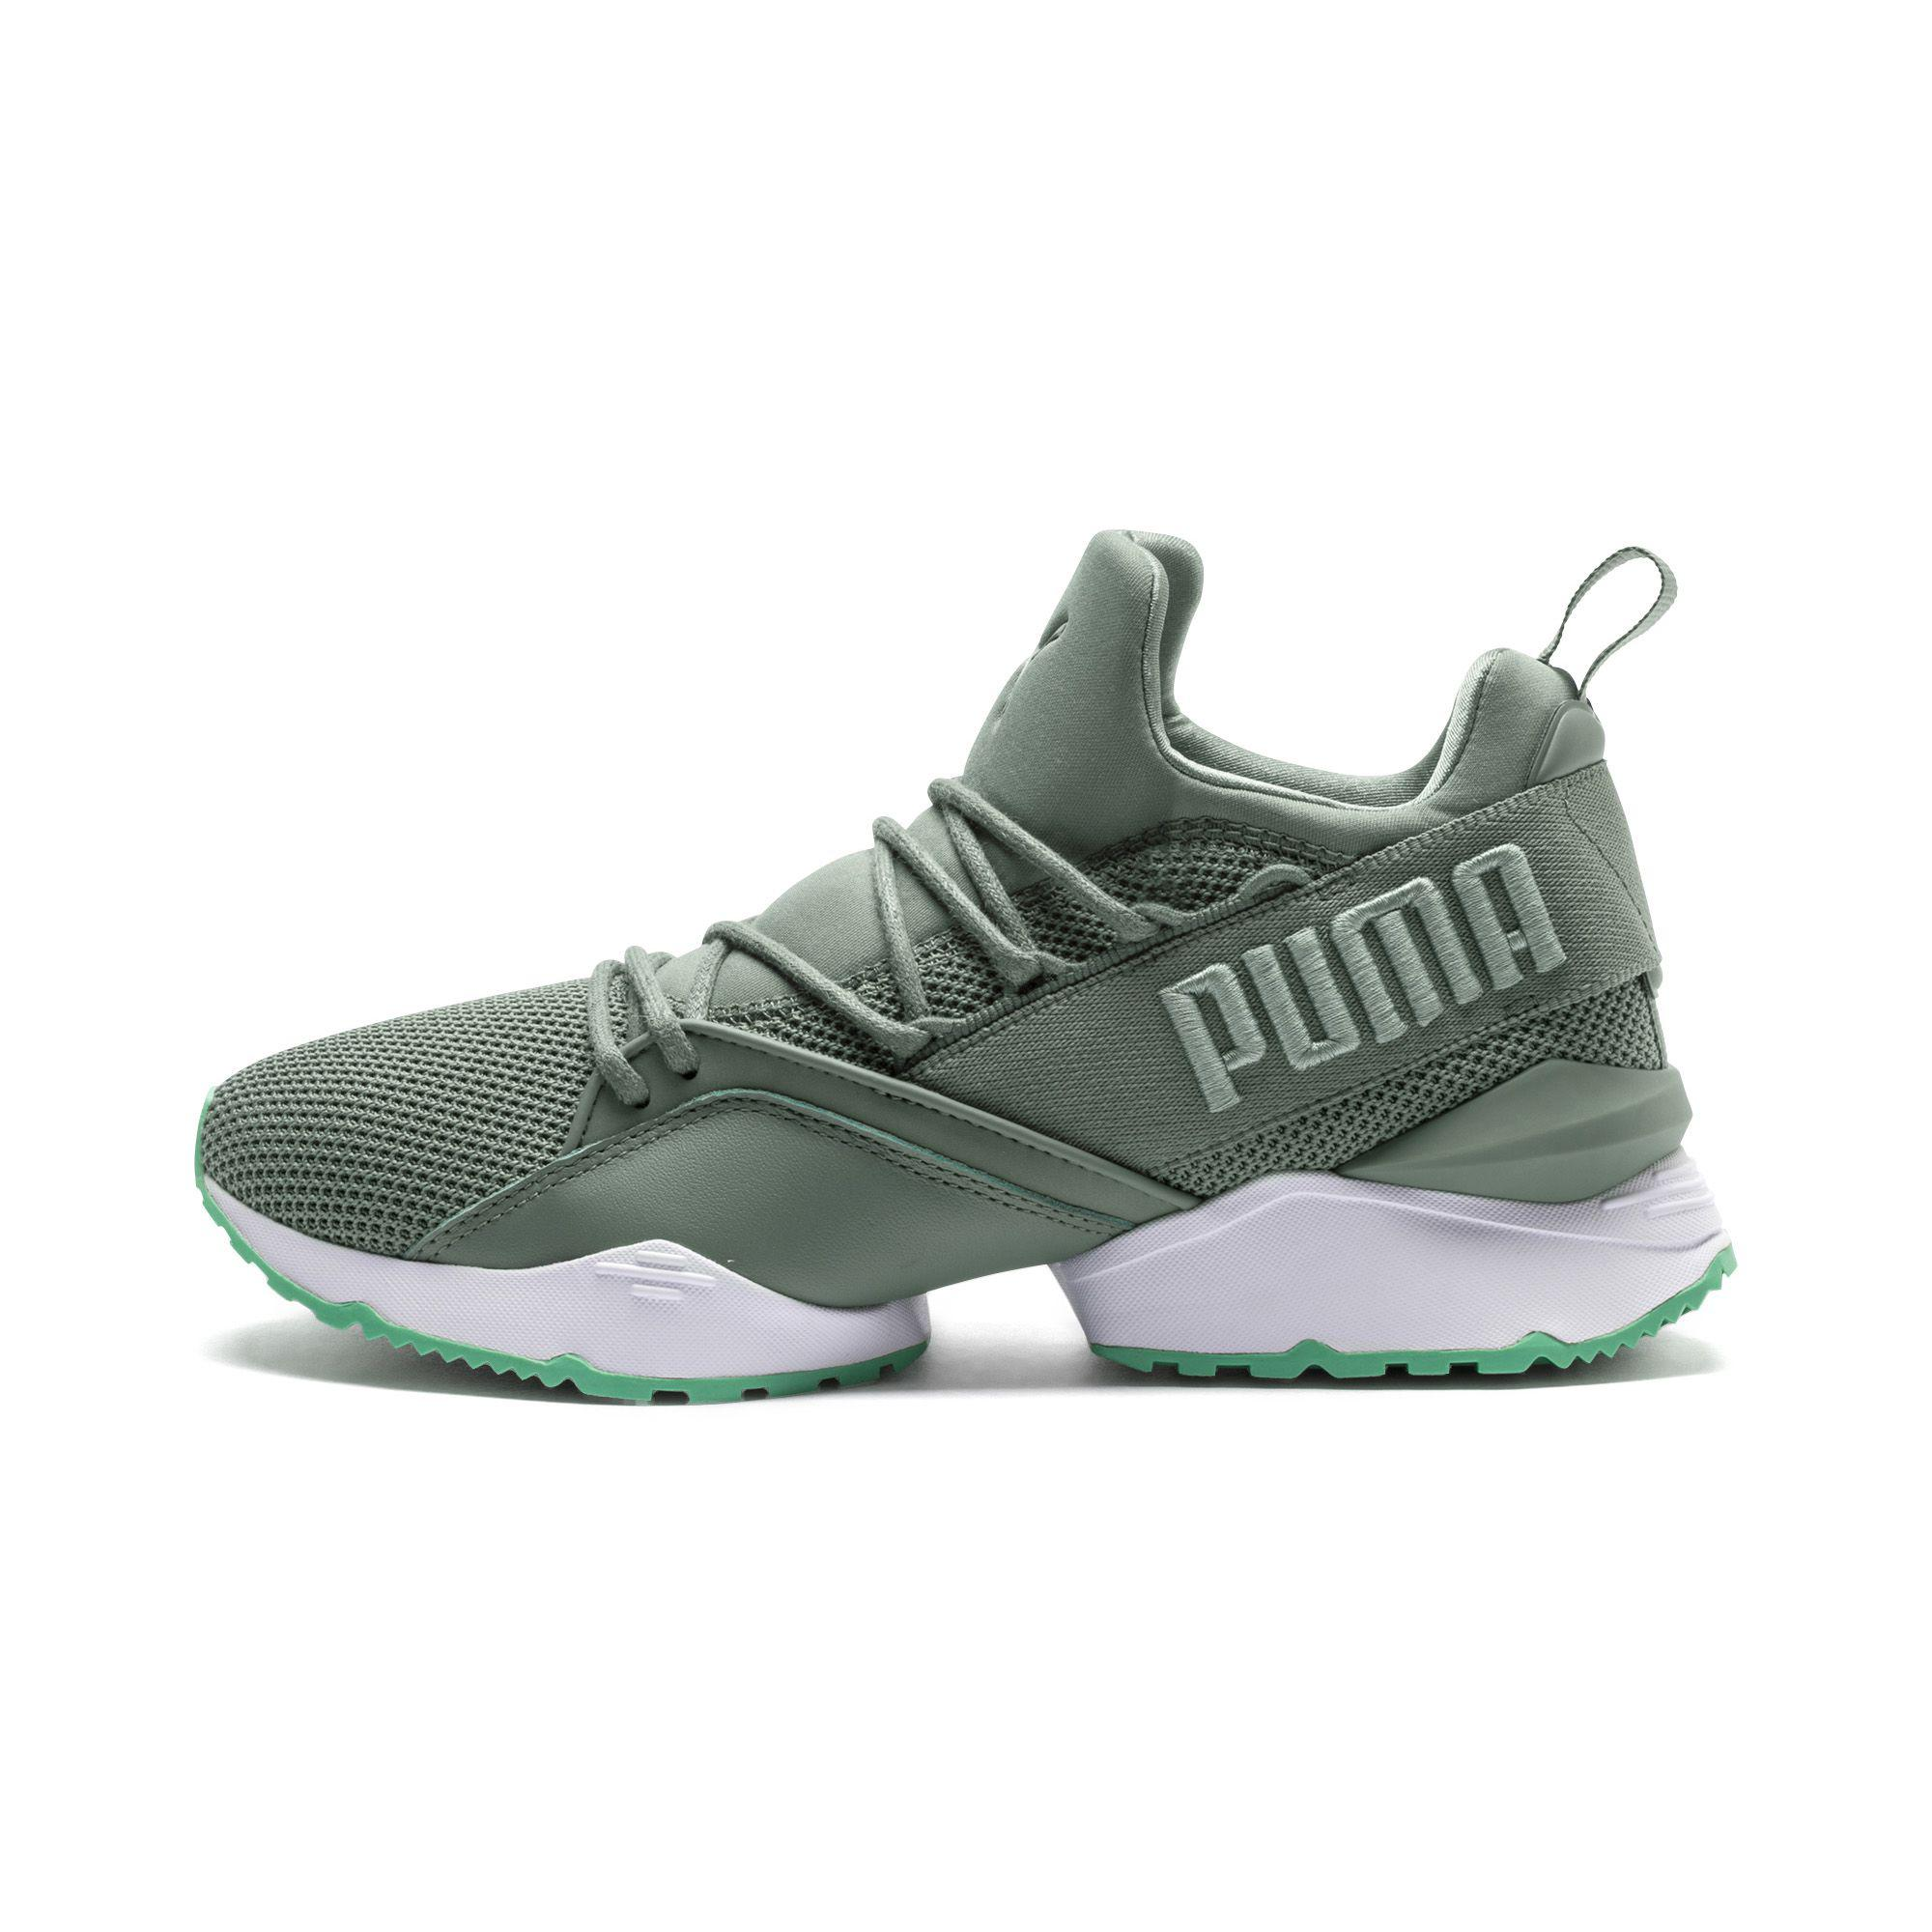 91a40460ffe3 Lyst - PUMA Muse Maia Street 2 Women s Sneakers in Green